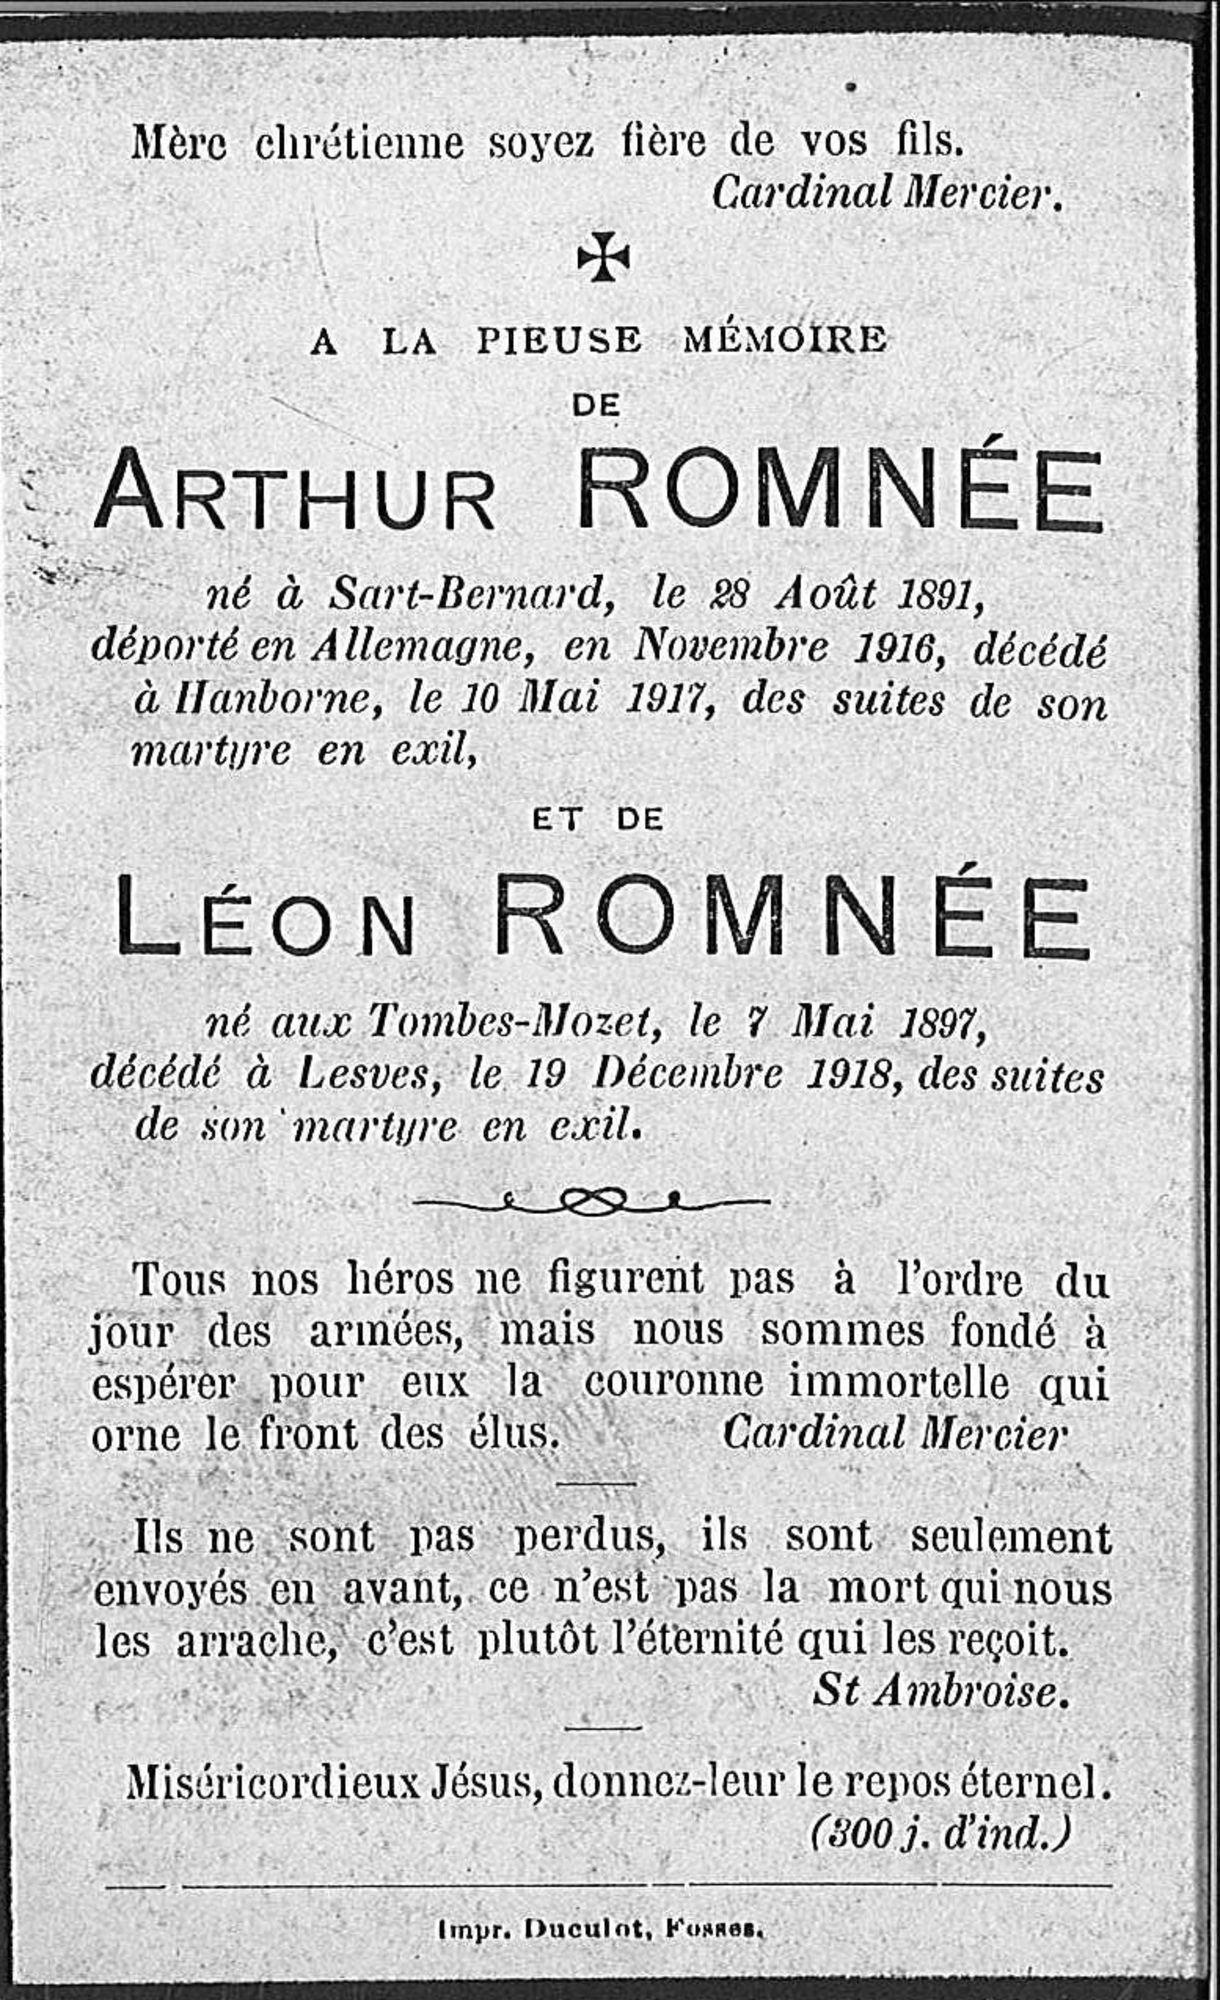 Léon Romnée